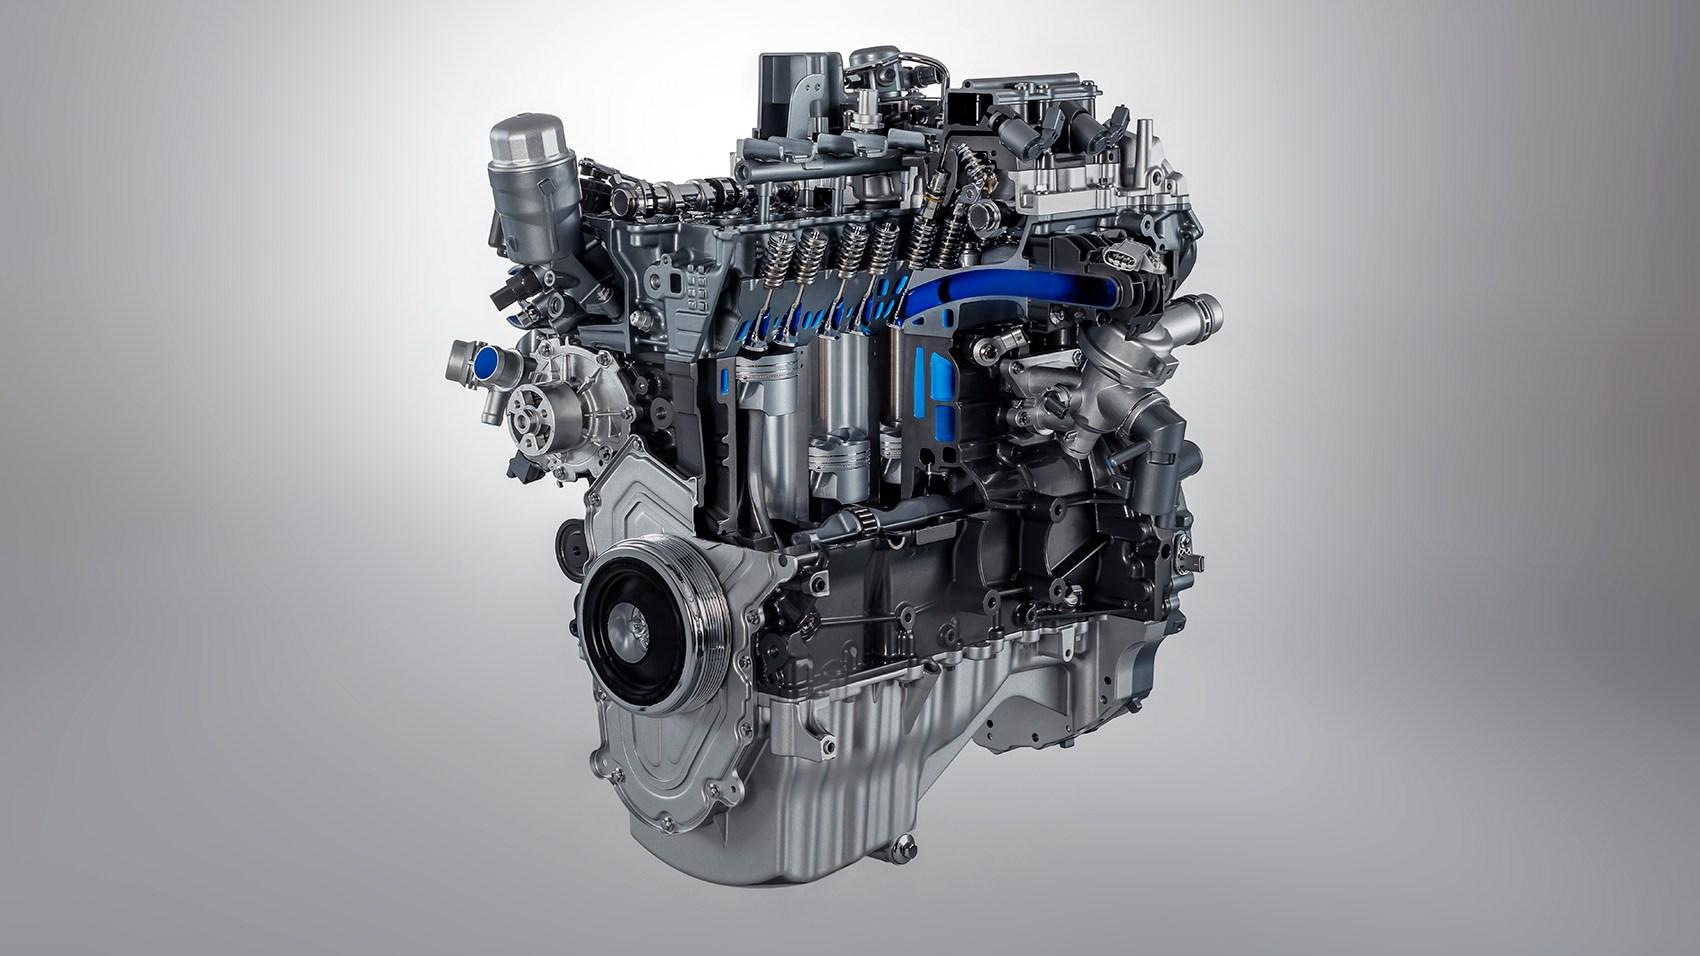 4 cylinder engine: the Ingenium motor powering the Jaguar F-type